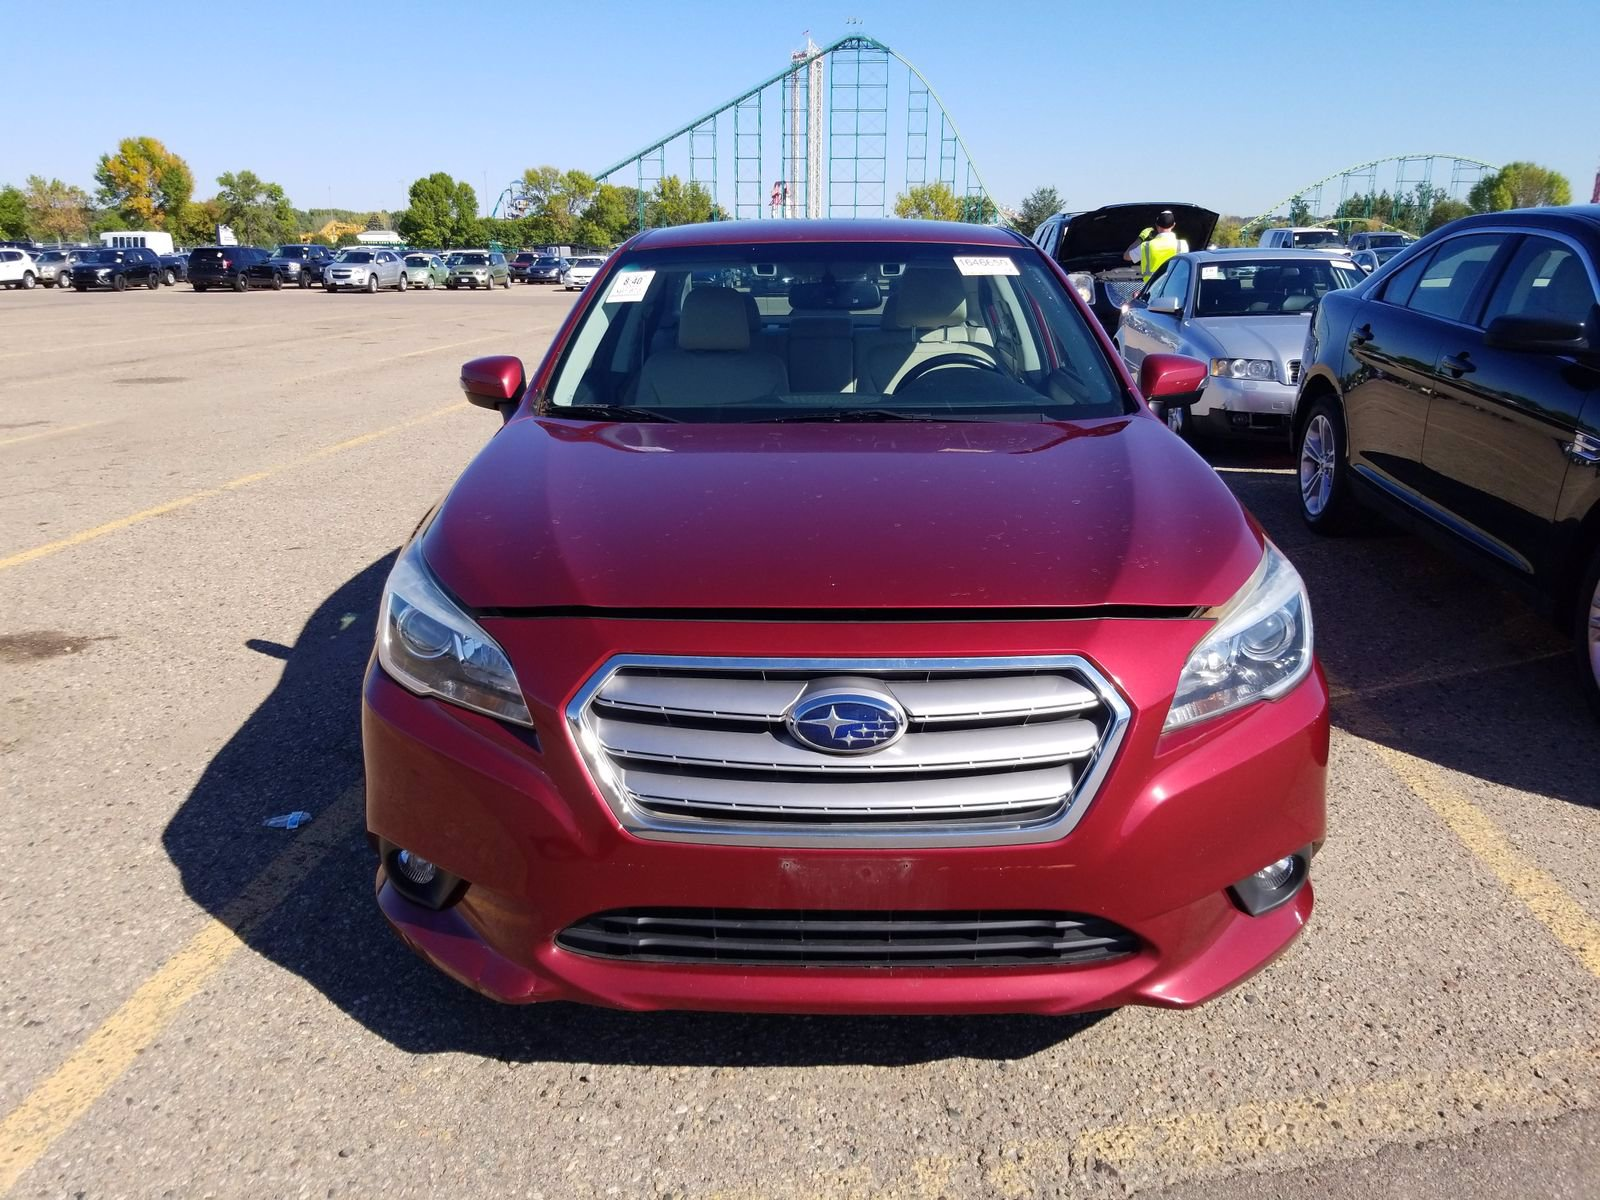 Used 2015 Subaru Legacy 2.5i Premium with VIN 4S3BNBF69F3044250 for sale in Saint Cloud, Minnesota